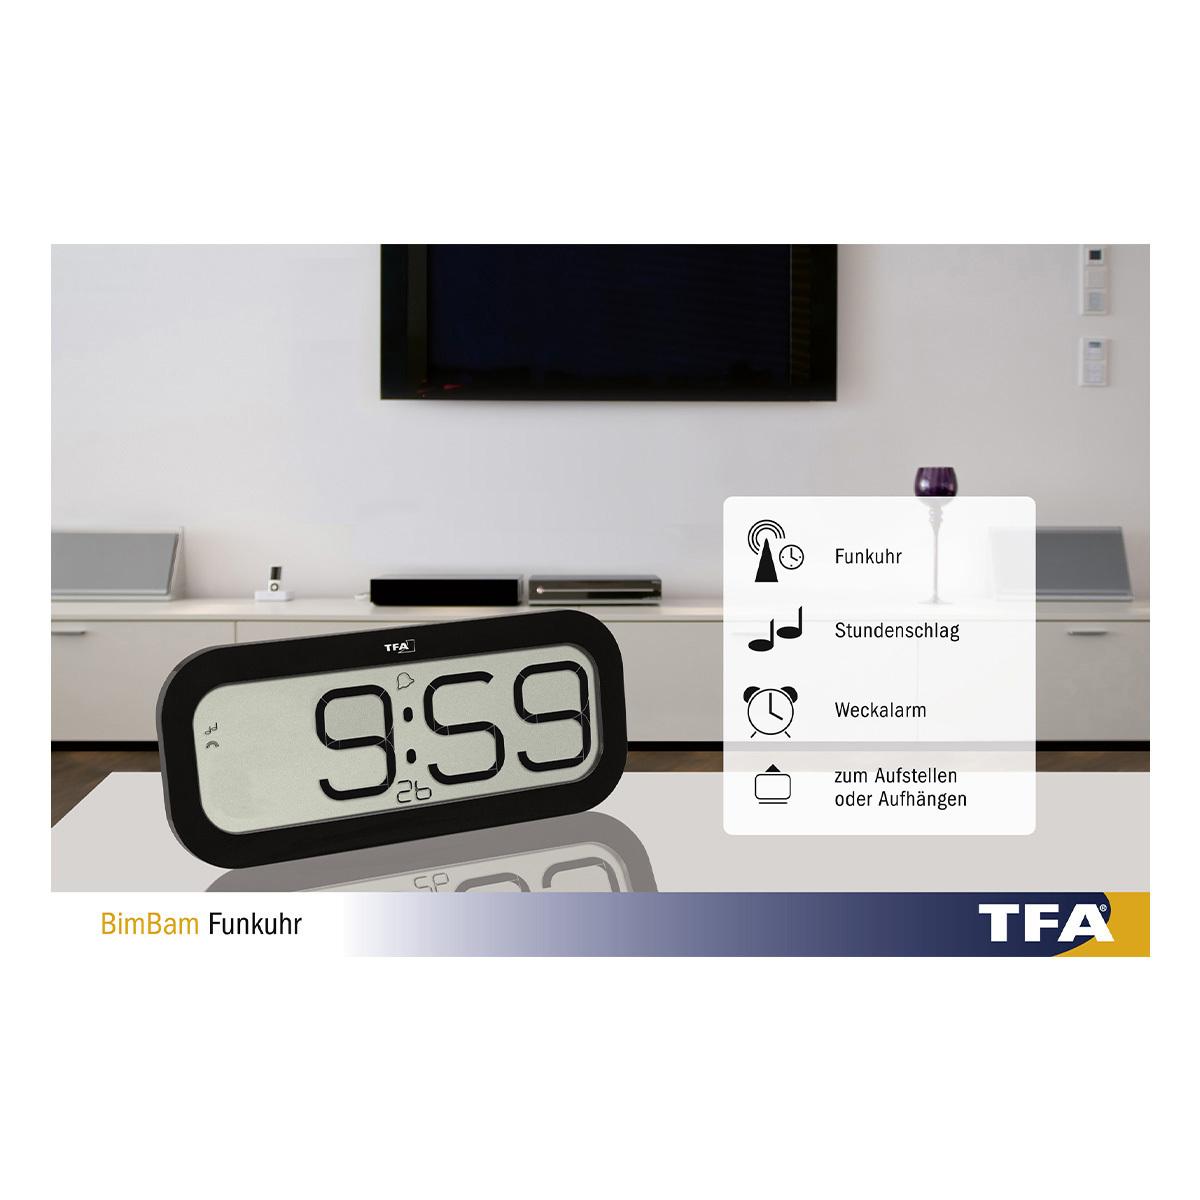 60-4514-01-digitale-funkuhr-mit-stundenschlag-bimbam-icons-1200x1200px.jpg